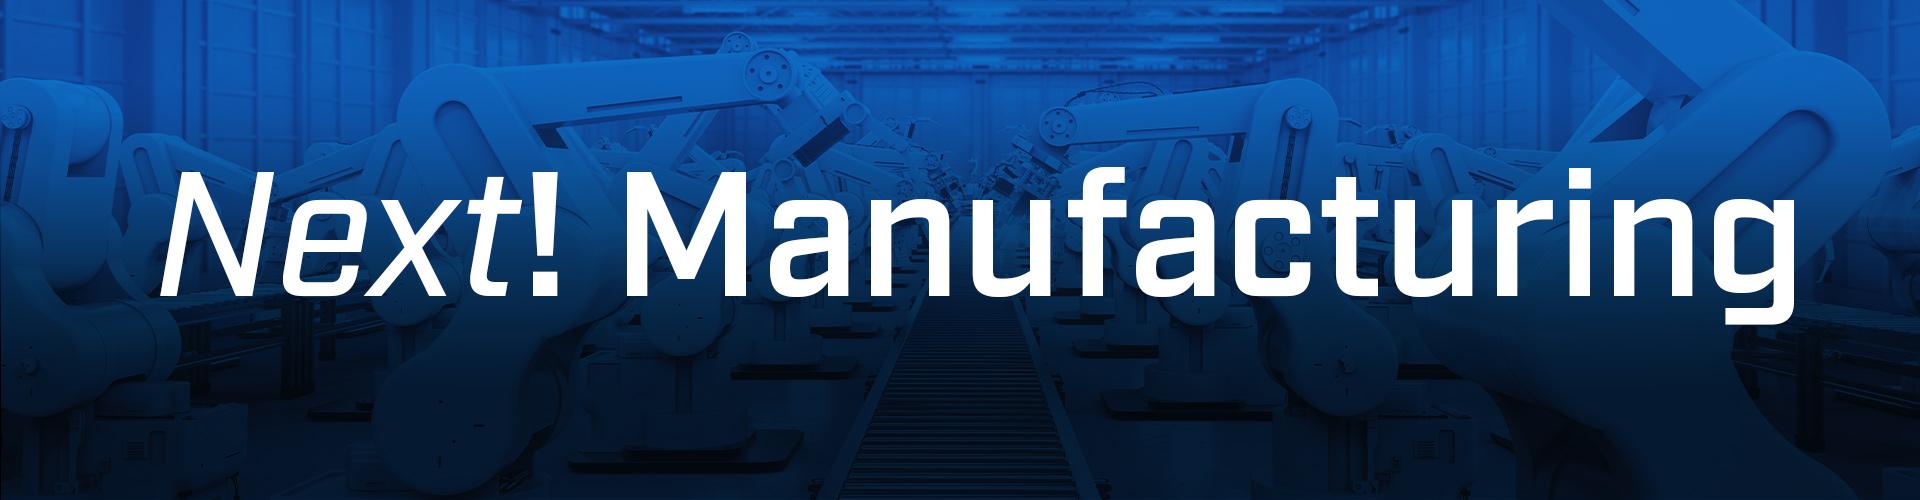 Banner_web_manufacturing